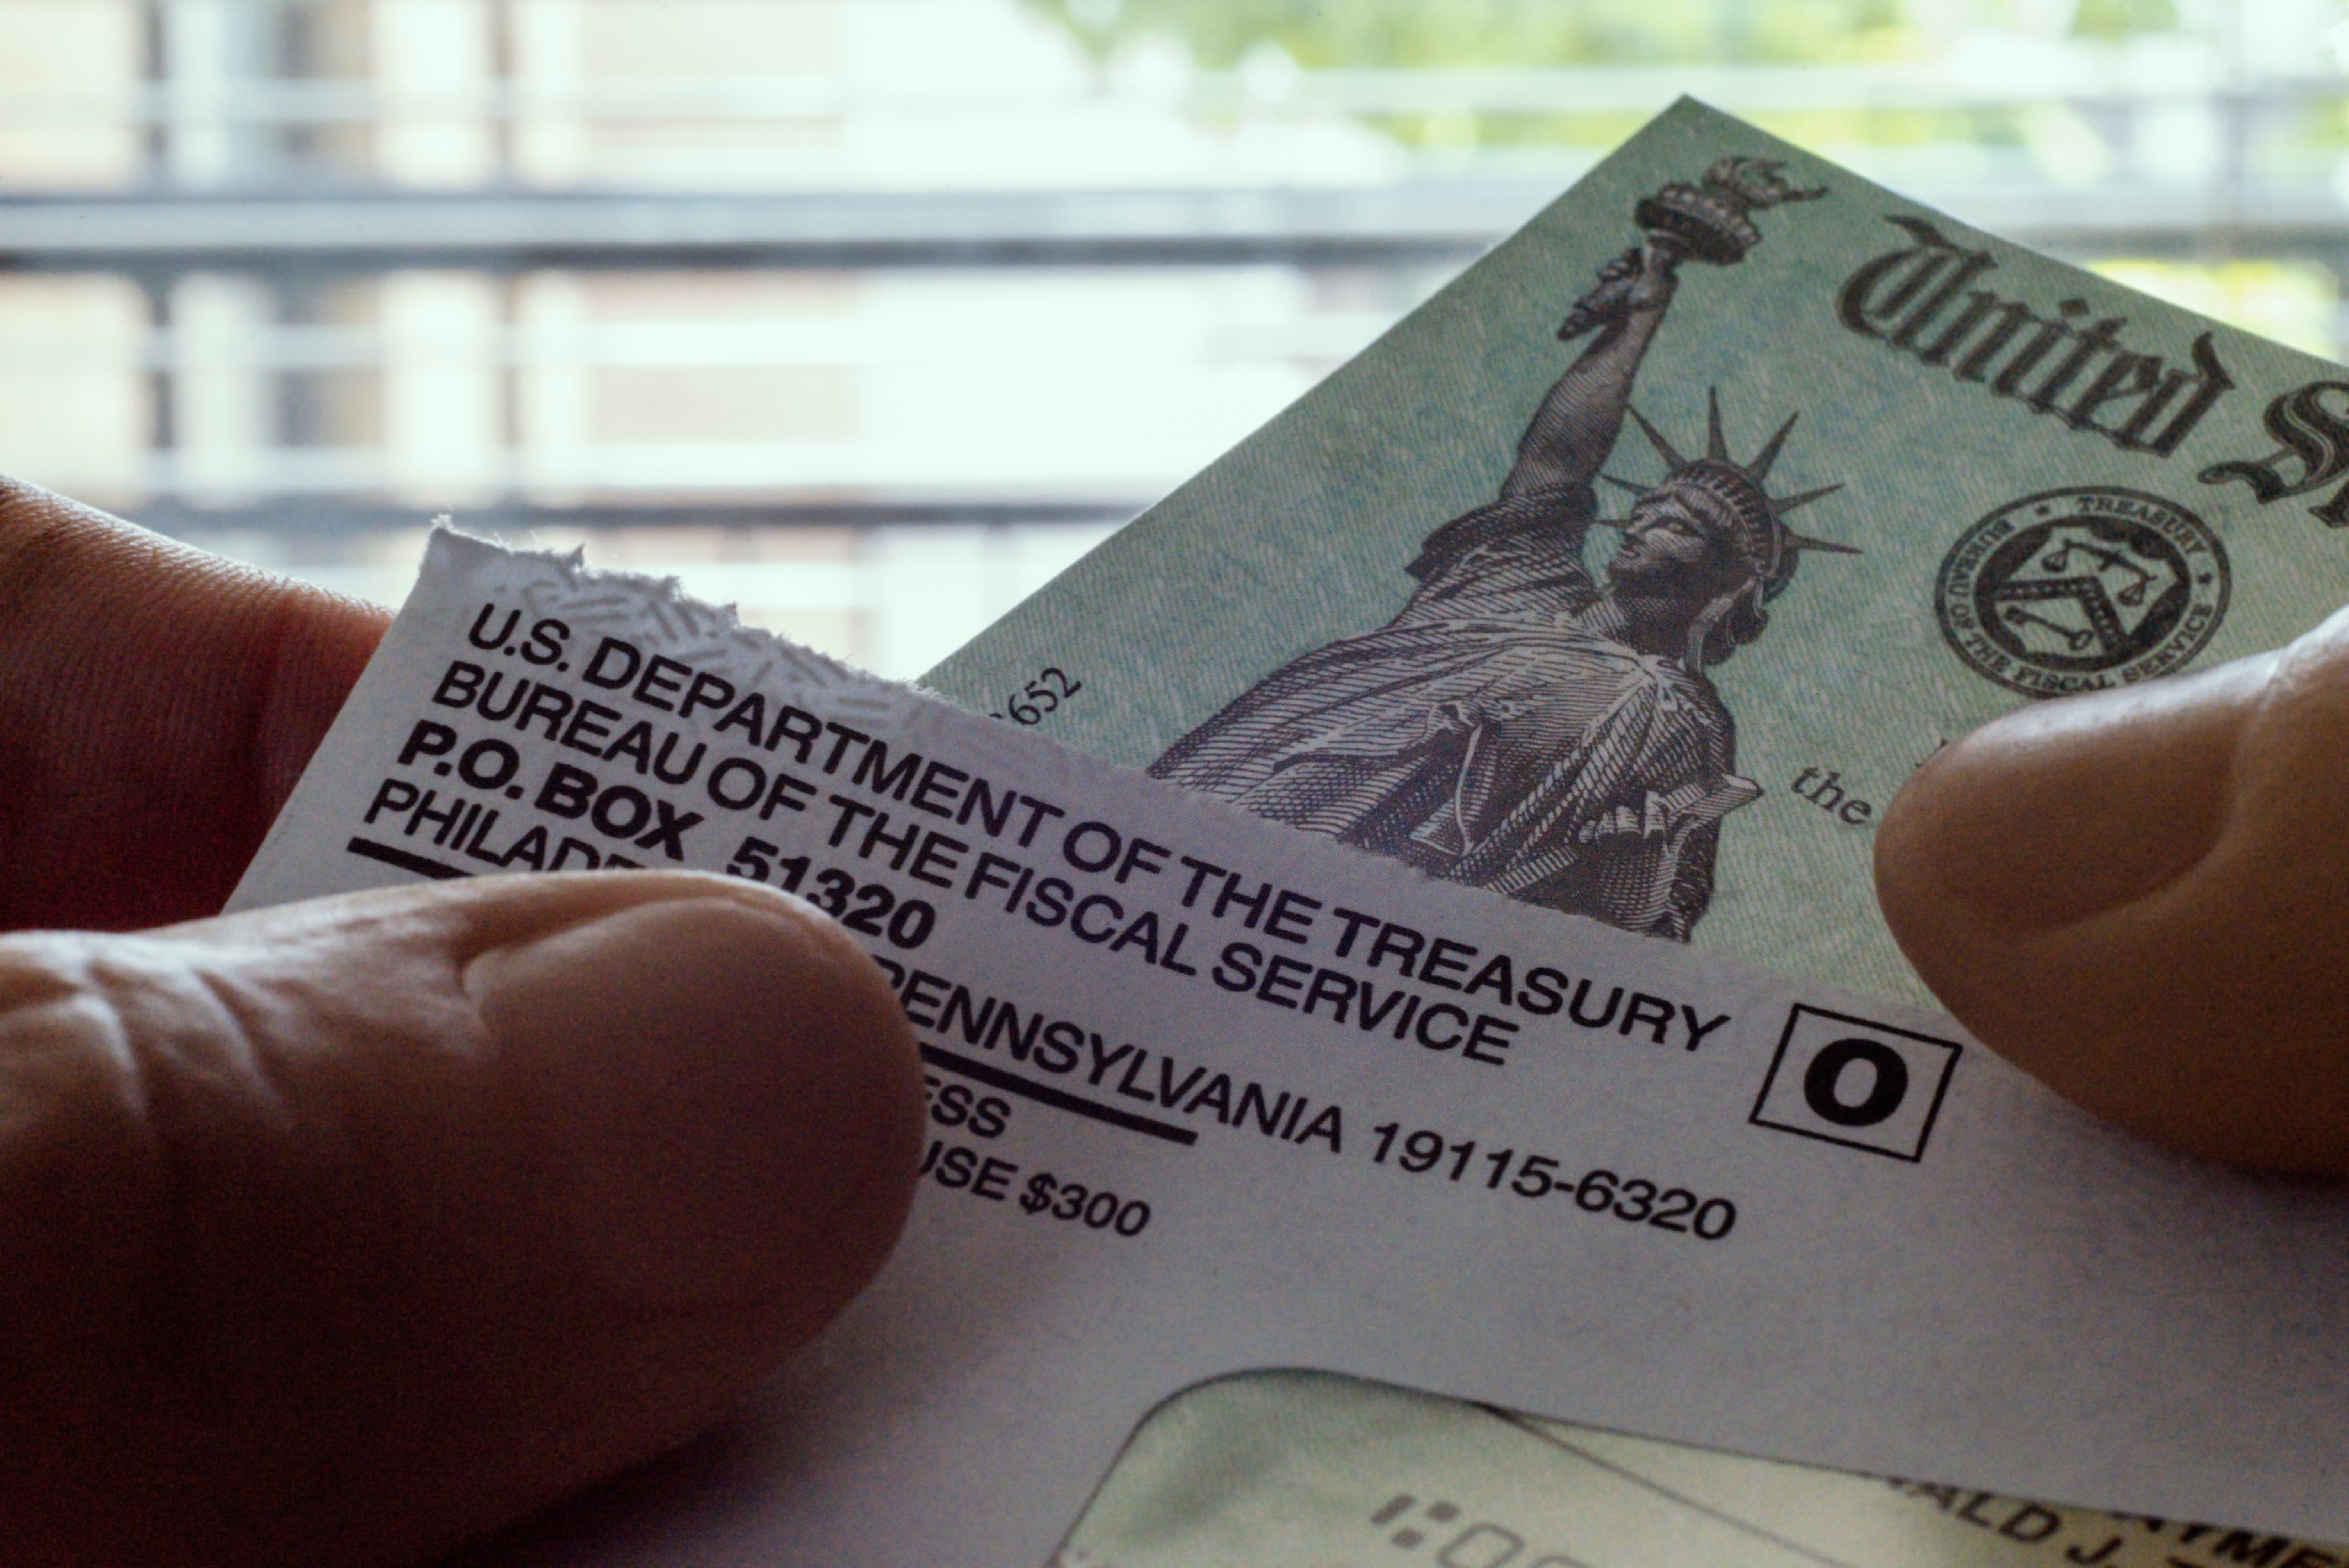 Jackson Hewitt, TaxAct: Stimulus checks to be deposited ...